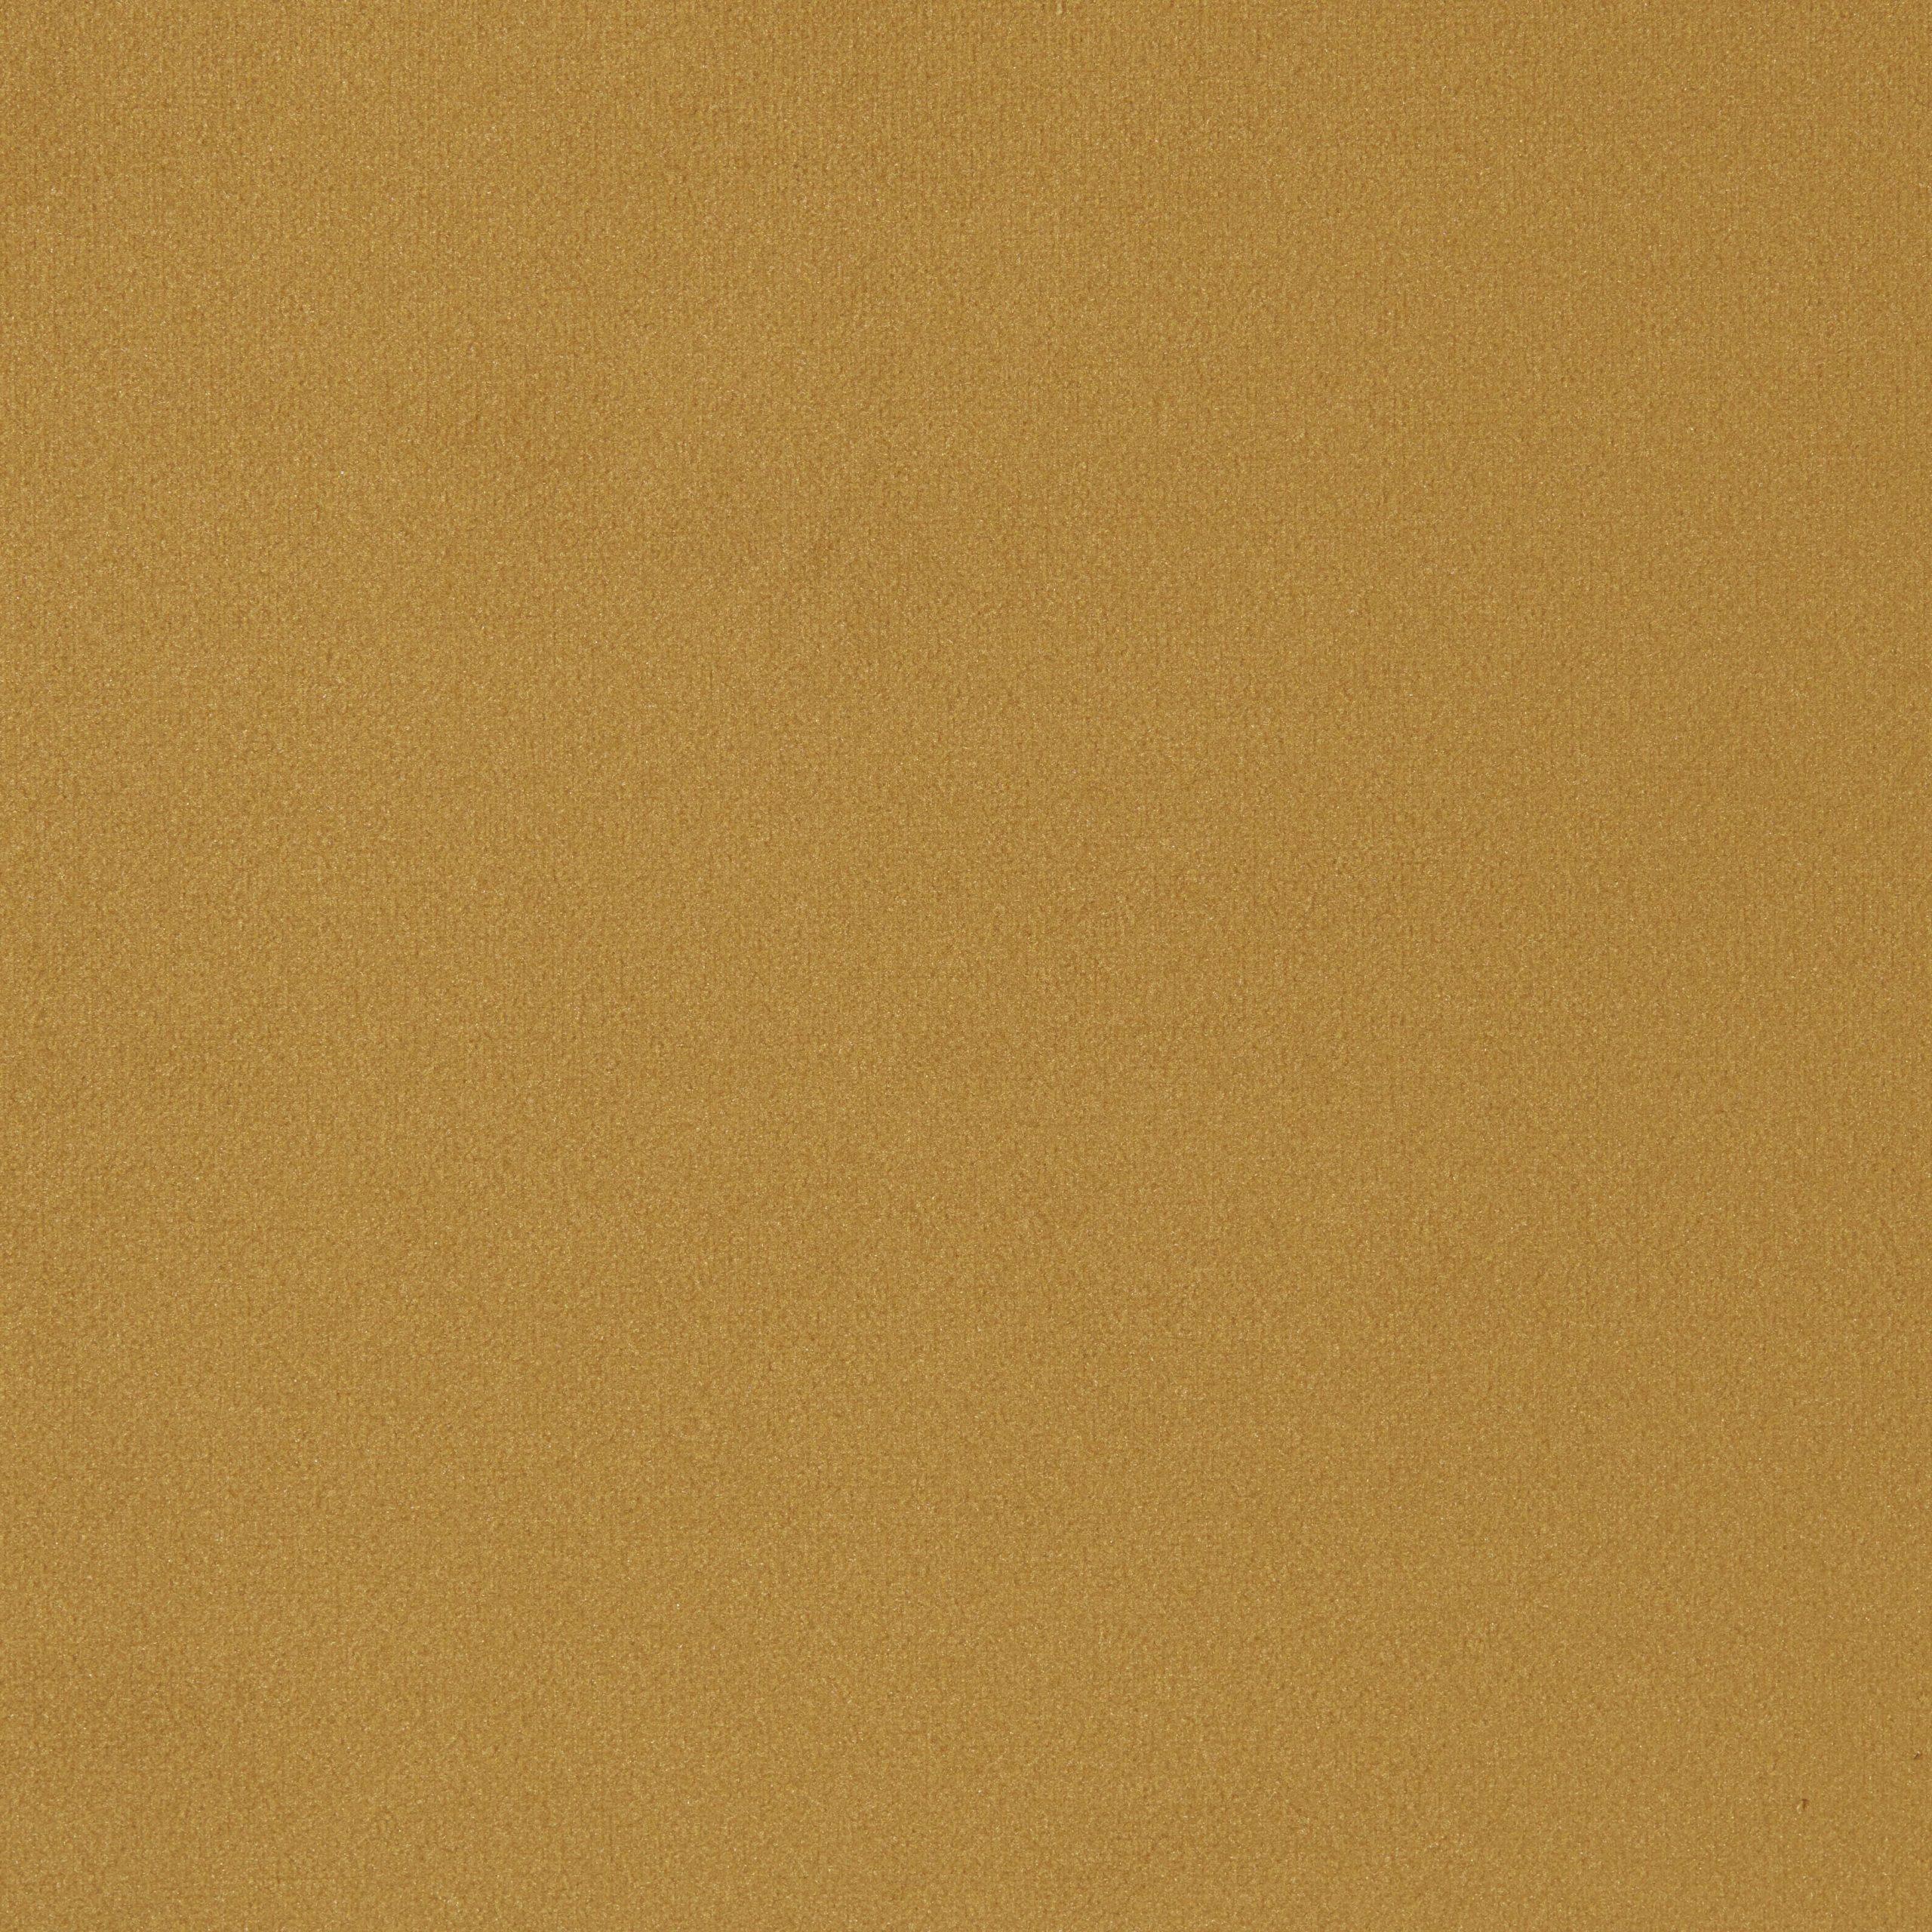 PLUSH - Saffron